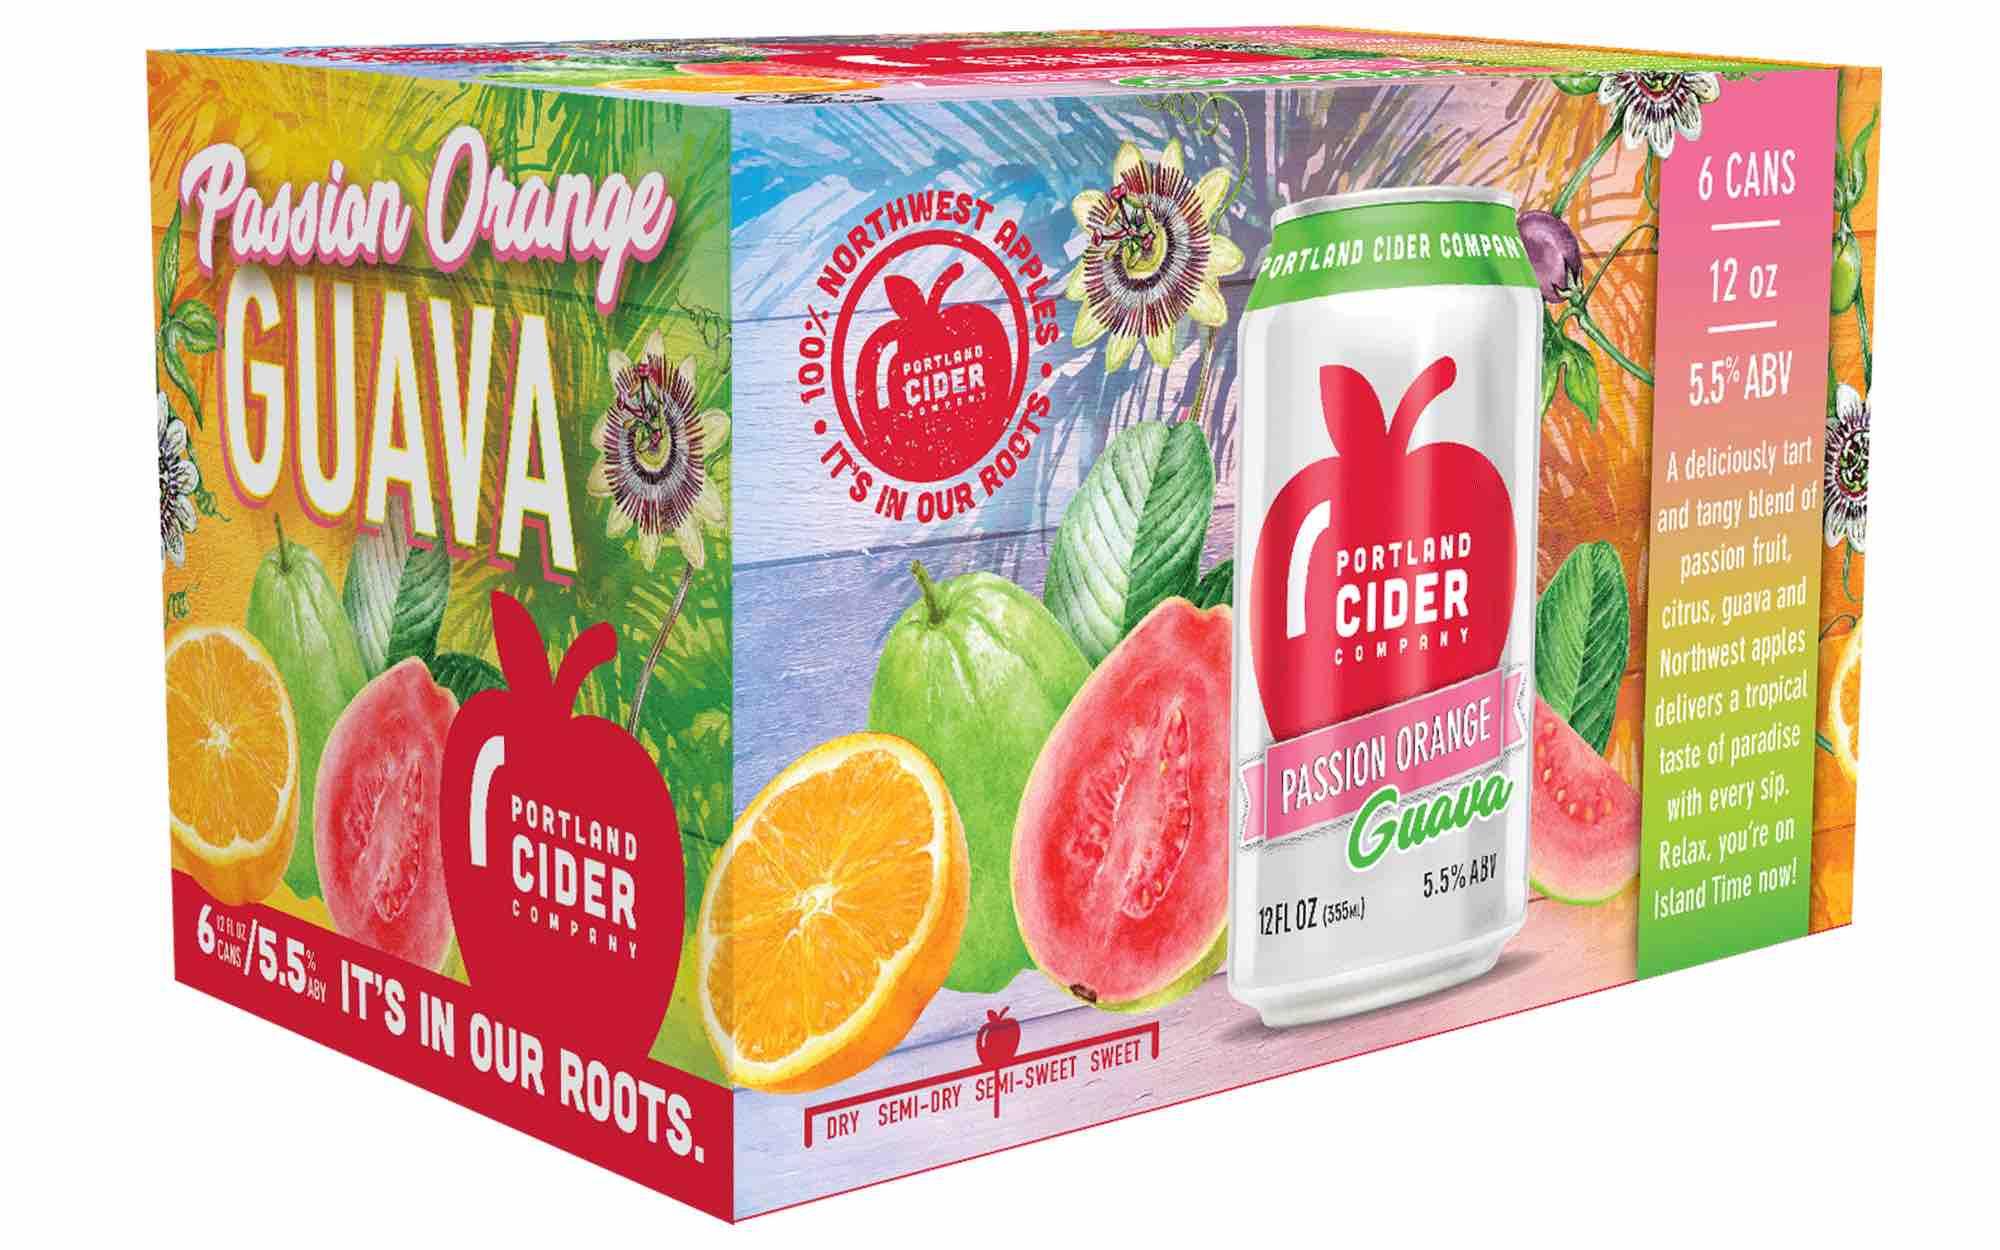 Portland Cider Passion Orange Guava